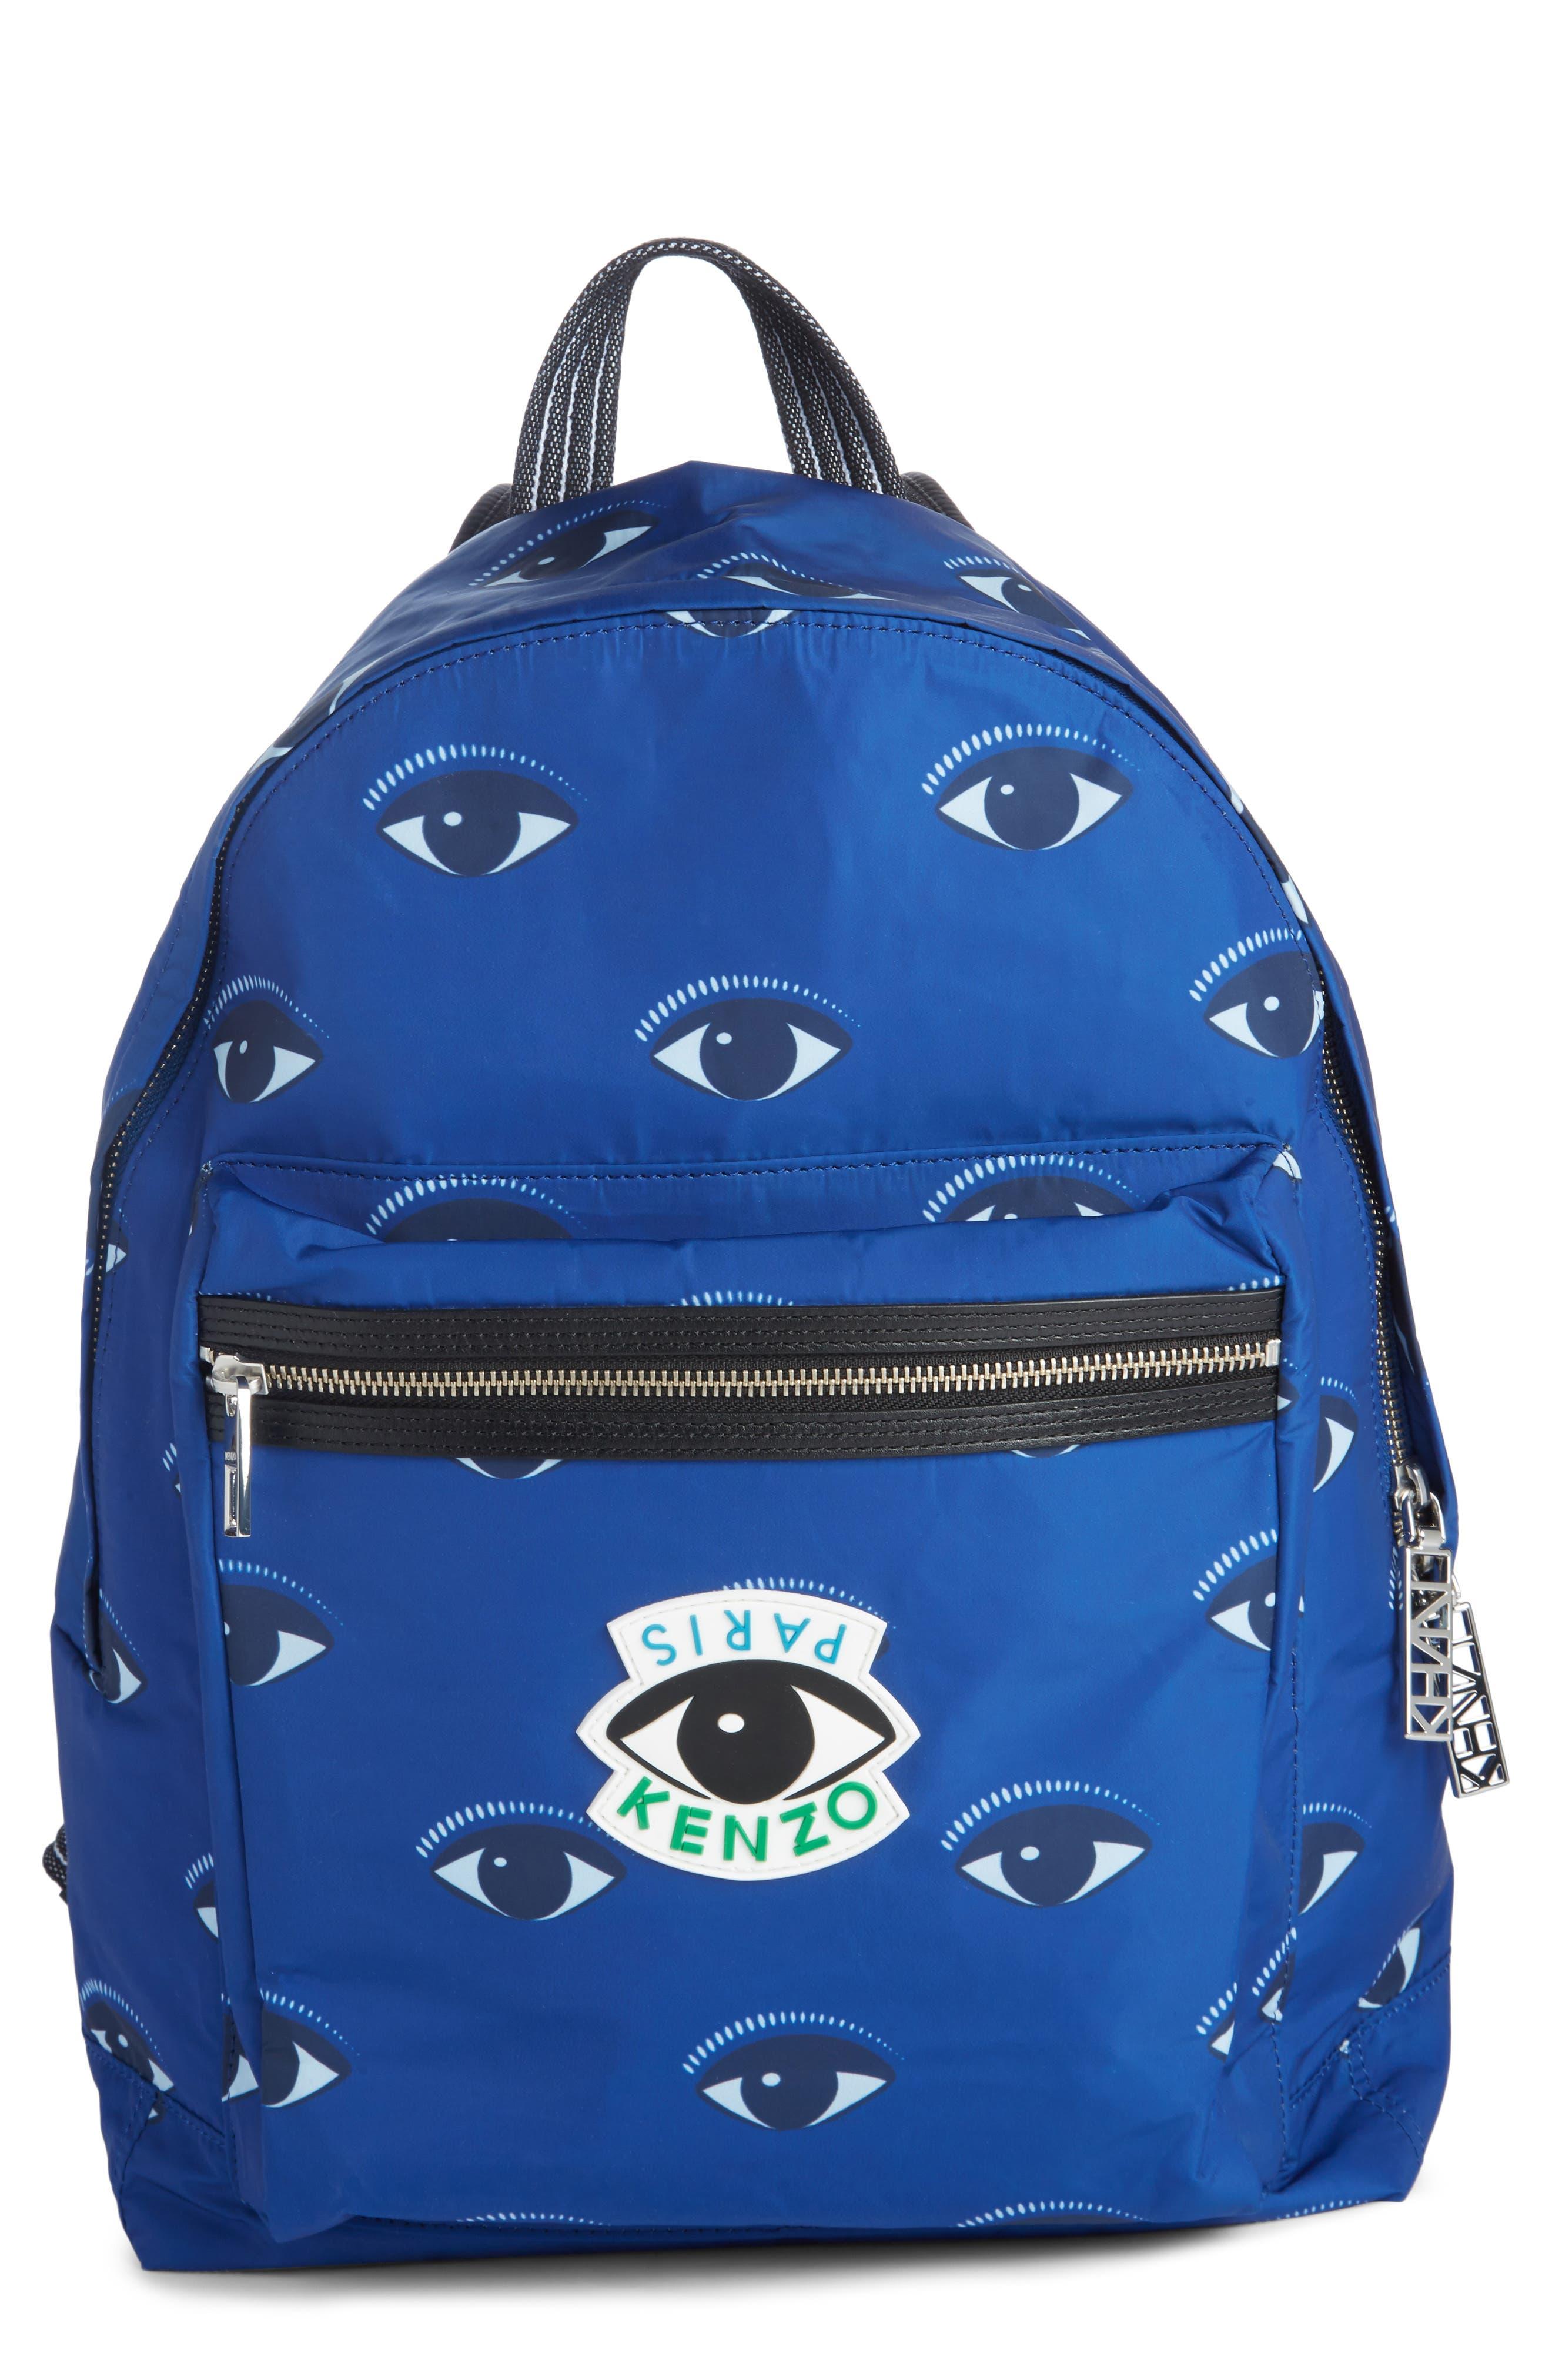 KENZO 'Eyes' Nylon Backpack